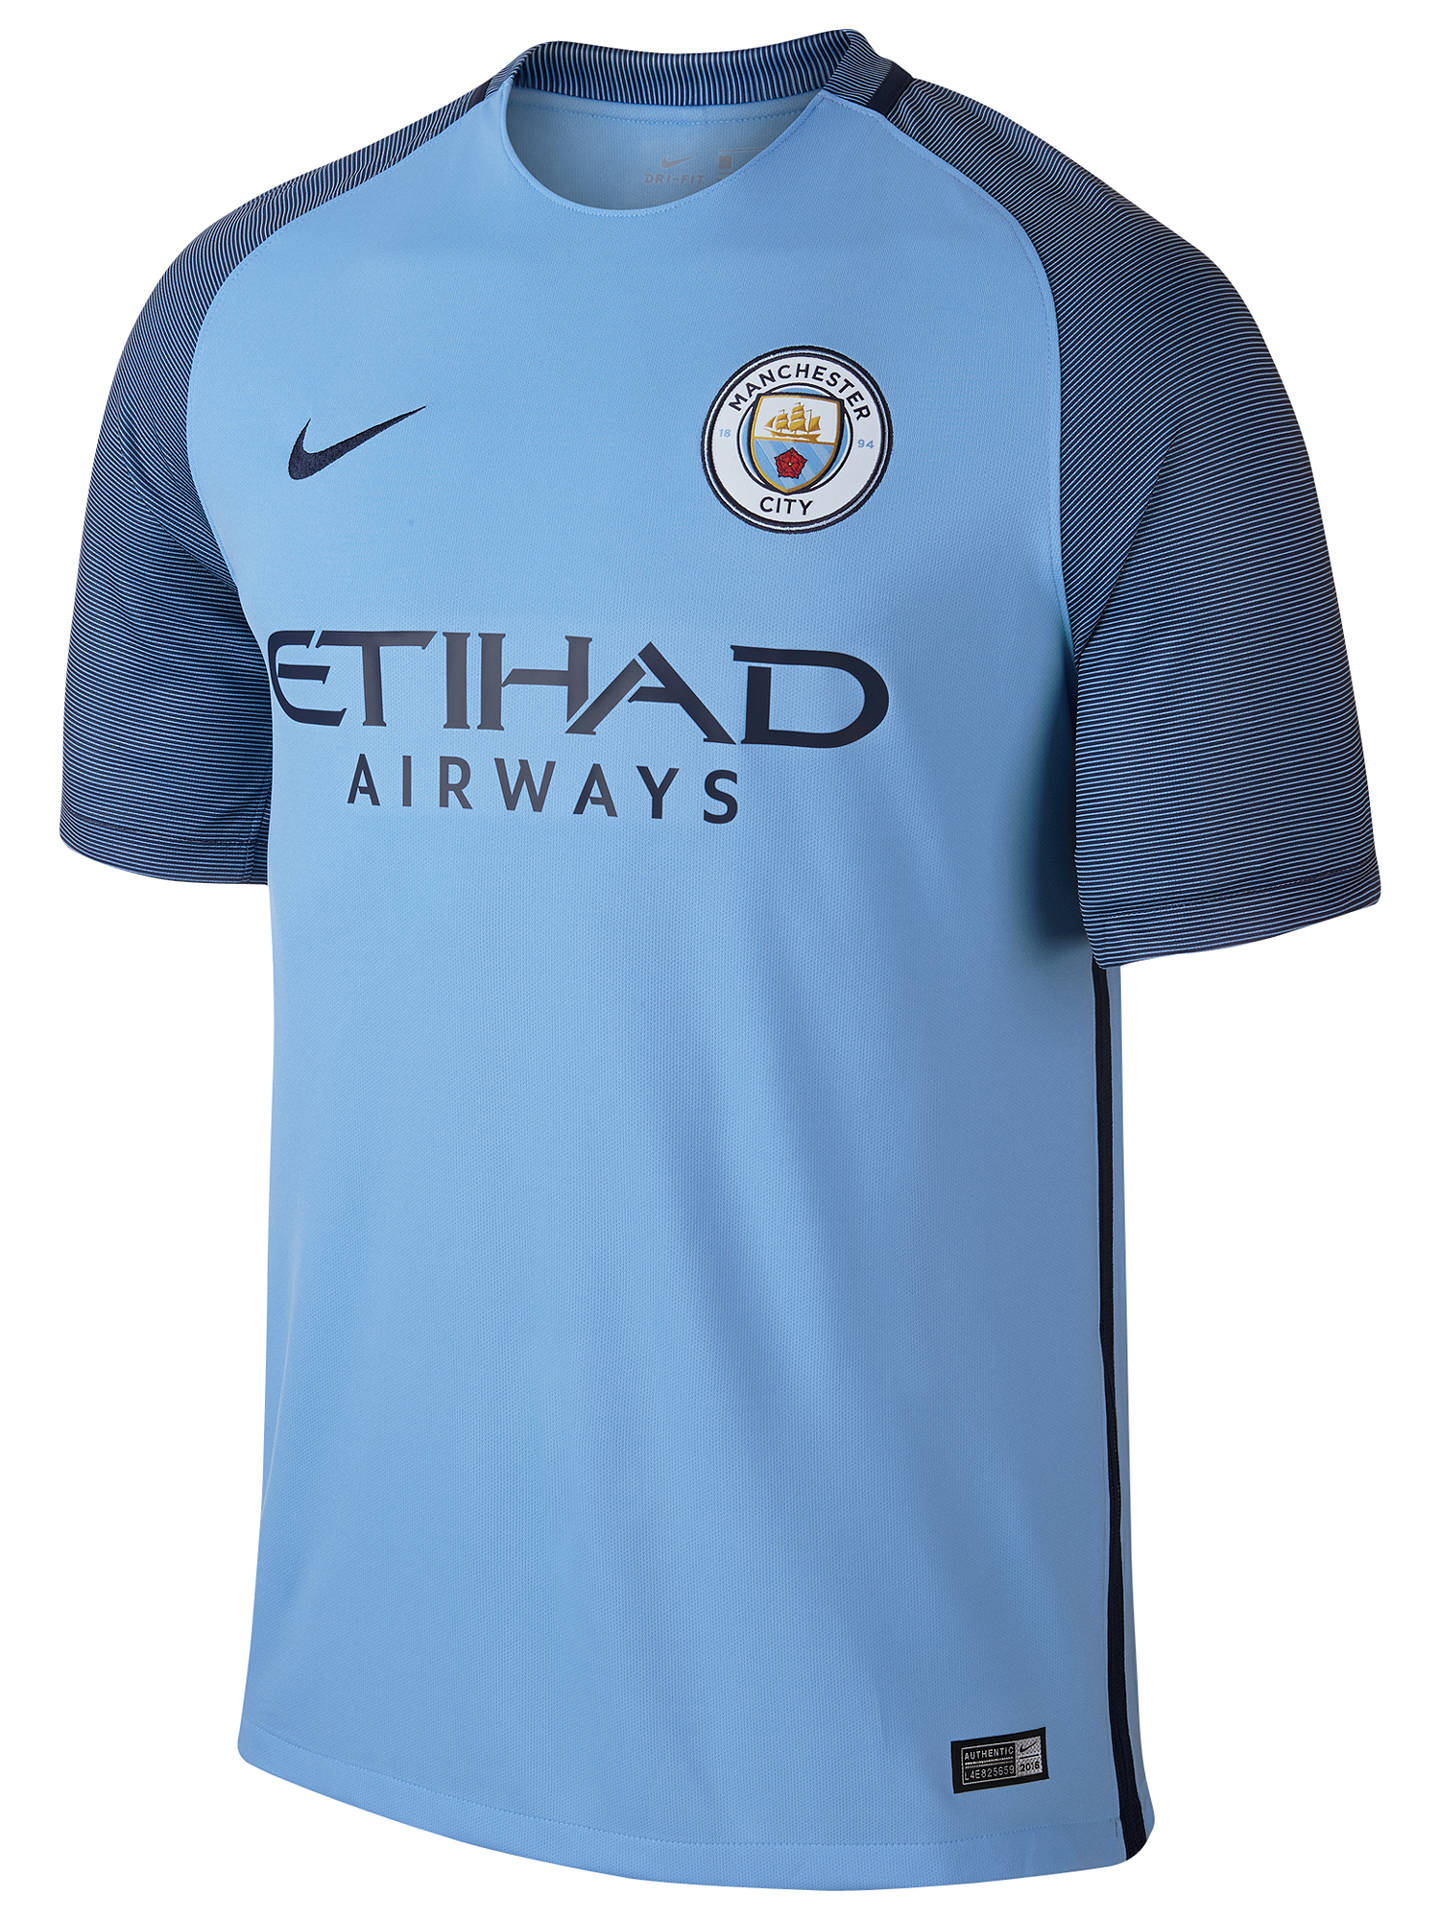 c4be7a2d56e Buy Nike 2016/17 Manchester City FC Home Football Shirt, Blue, S Online ...